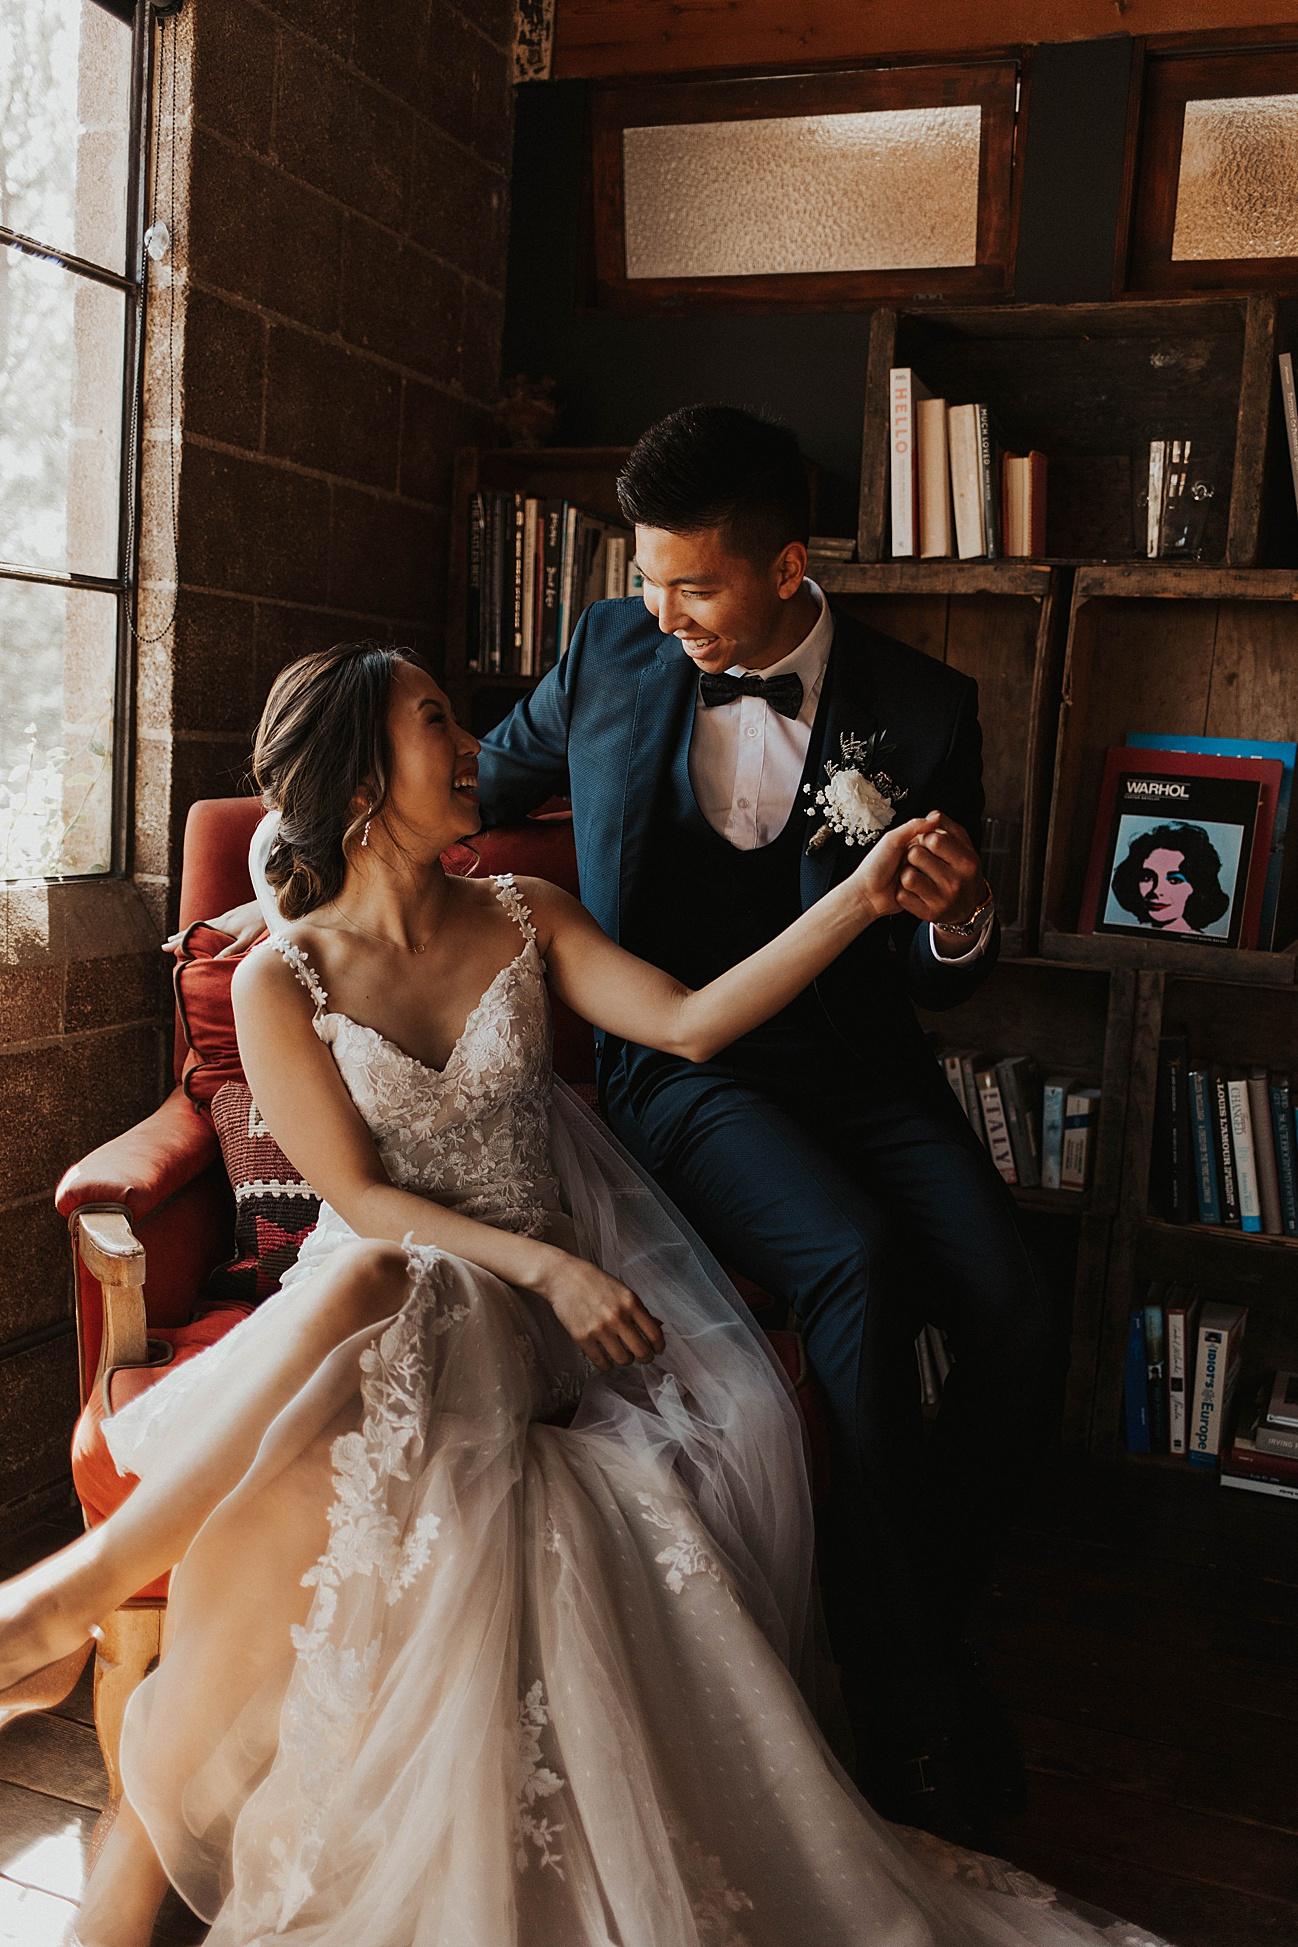 smoky-hollows-studio-wedding33.jpg